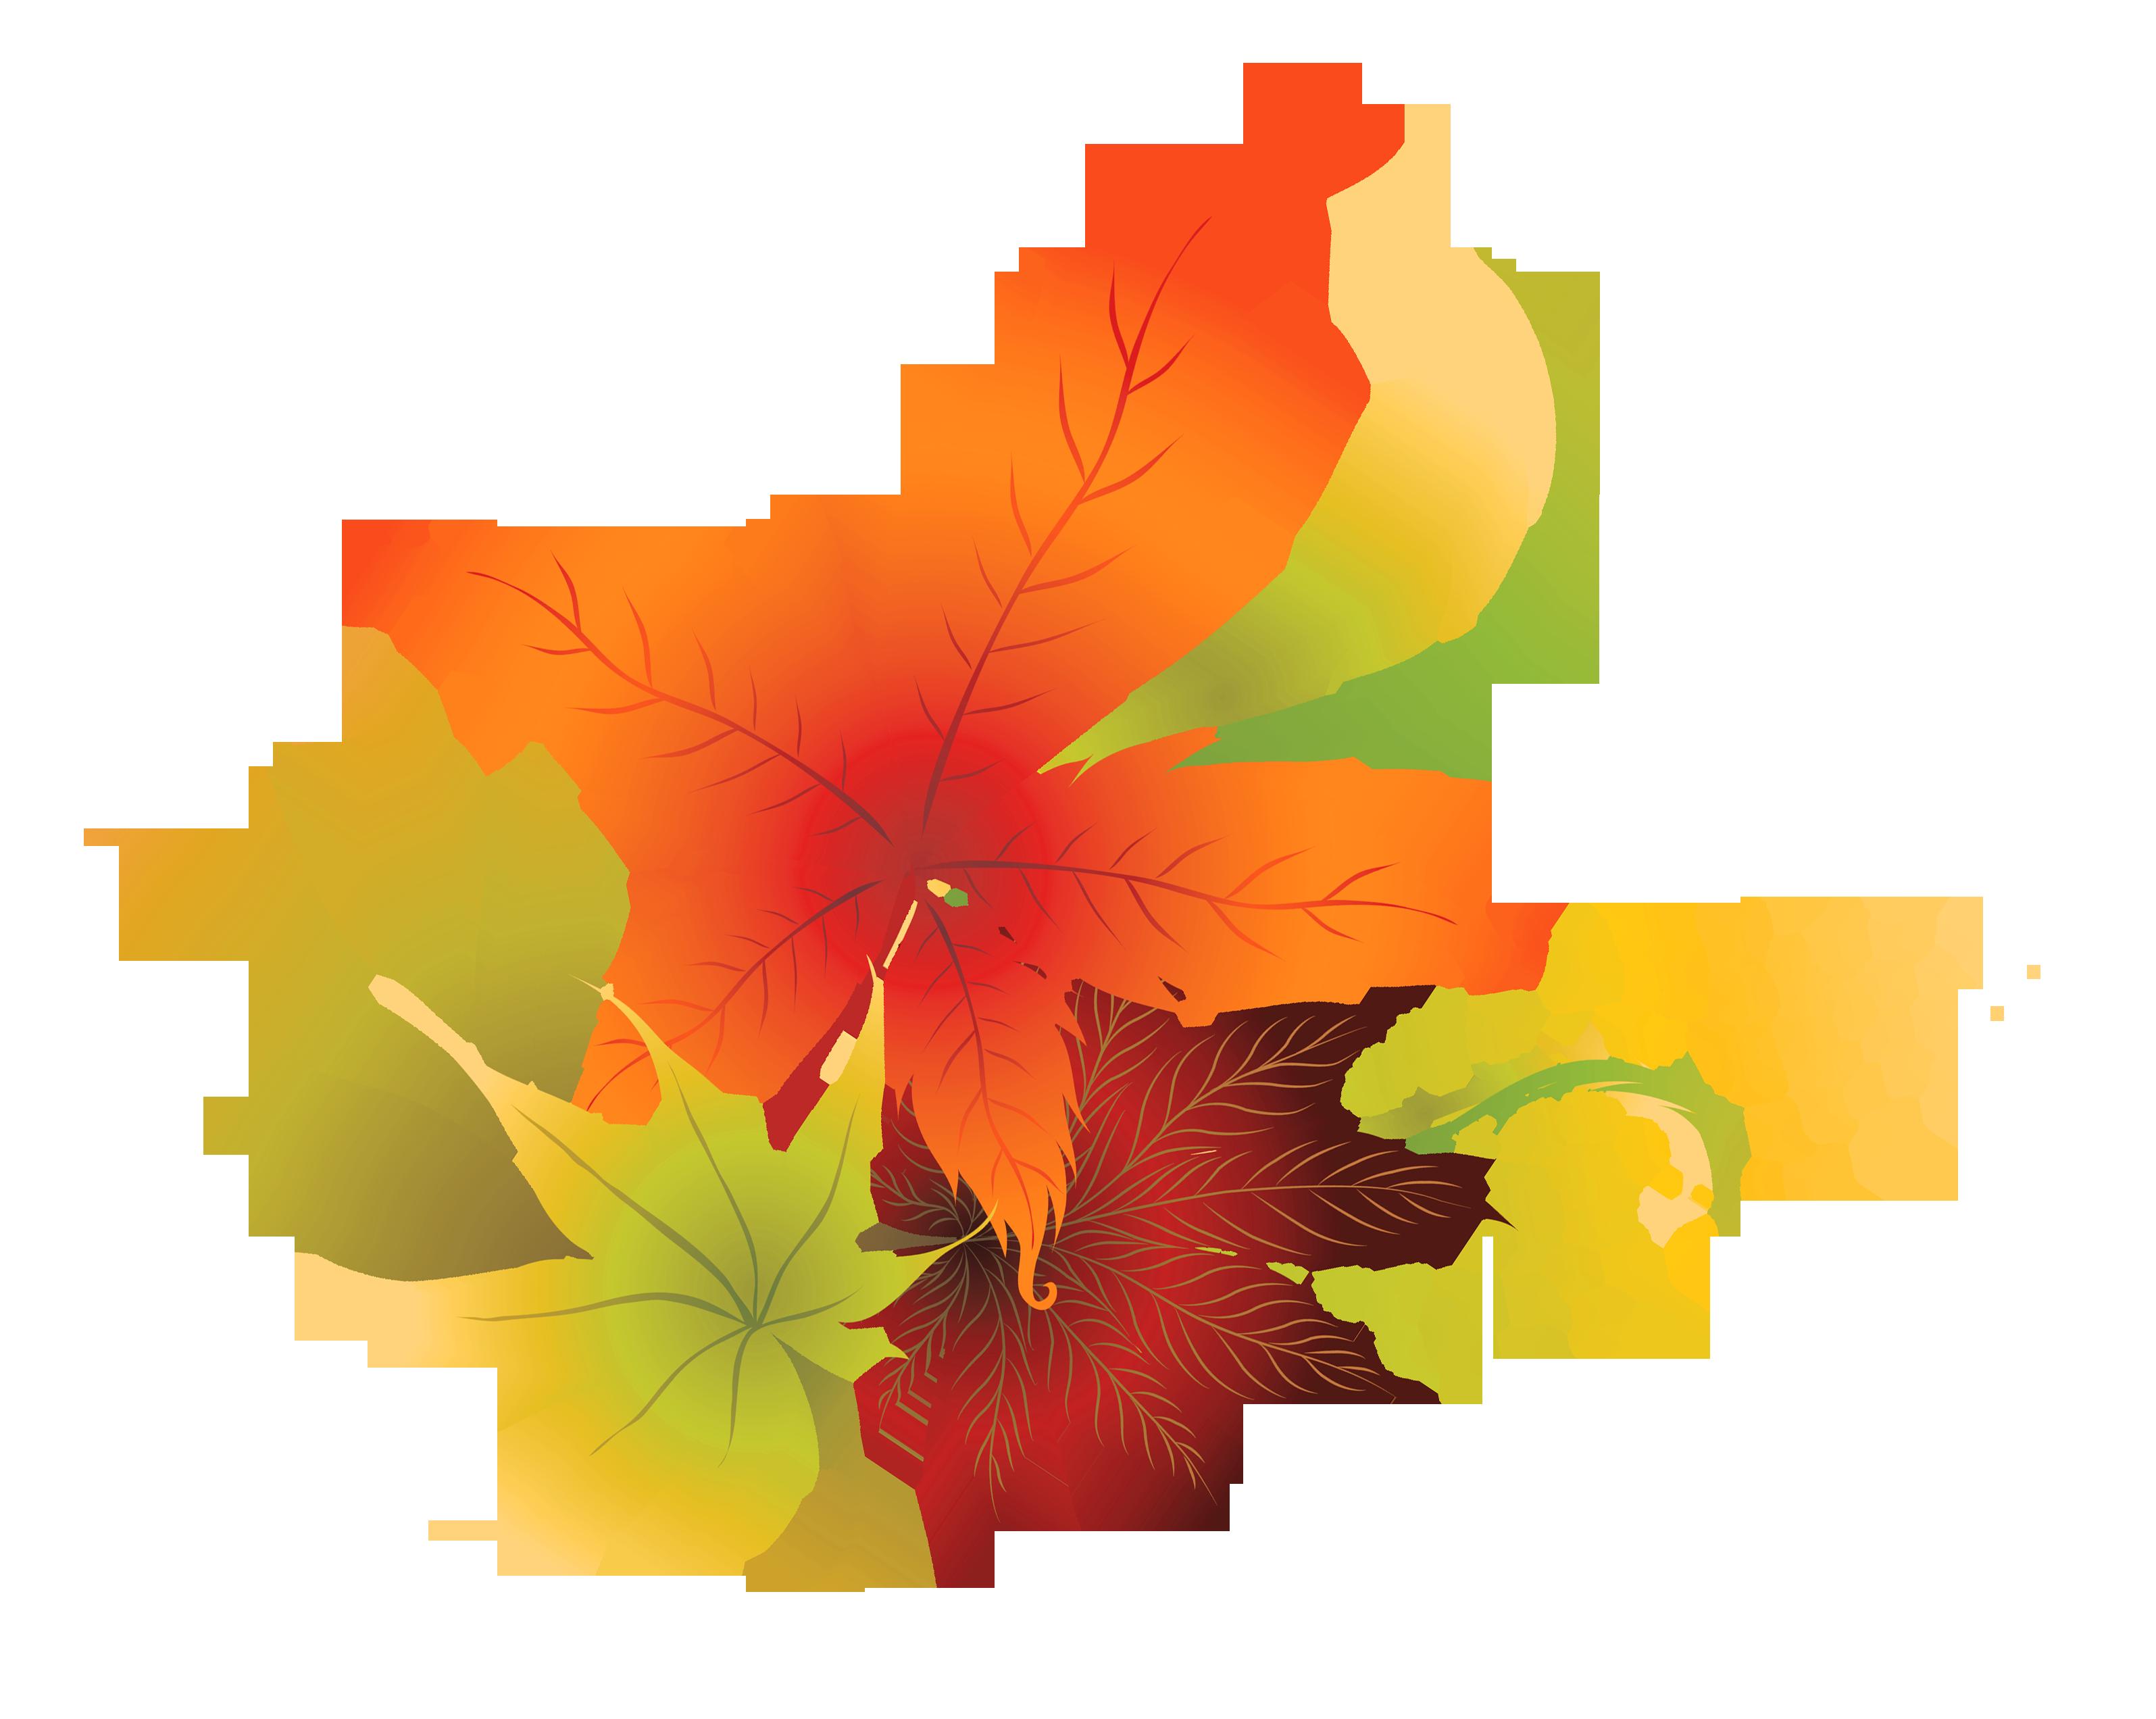 Fall leaves 7 free autumn and fall clip -Fall leaves 7 free autumn and fall clip art collections 2 clipartcow-17